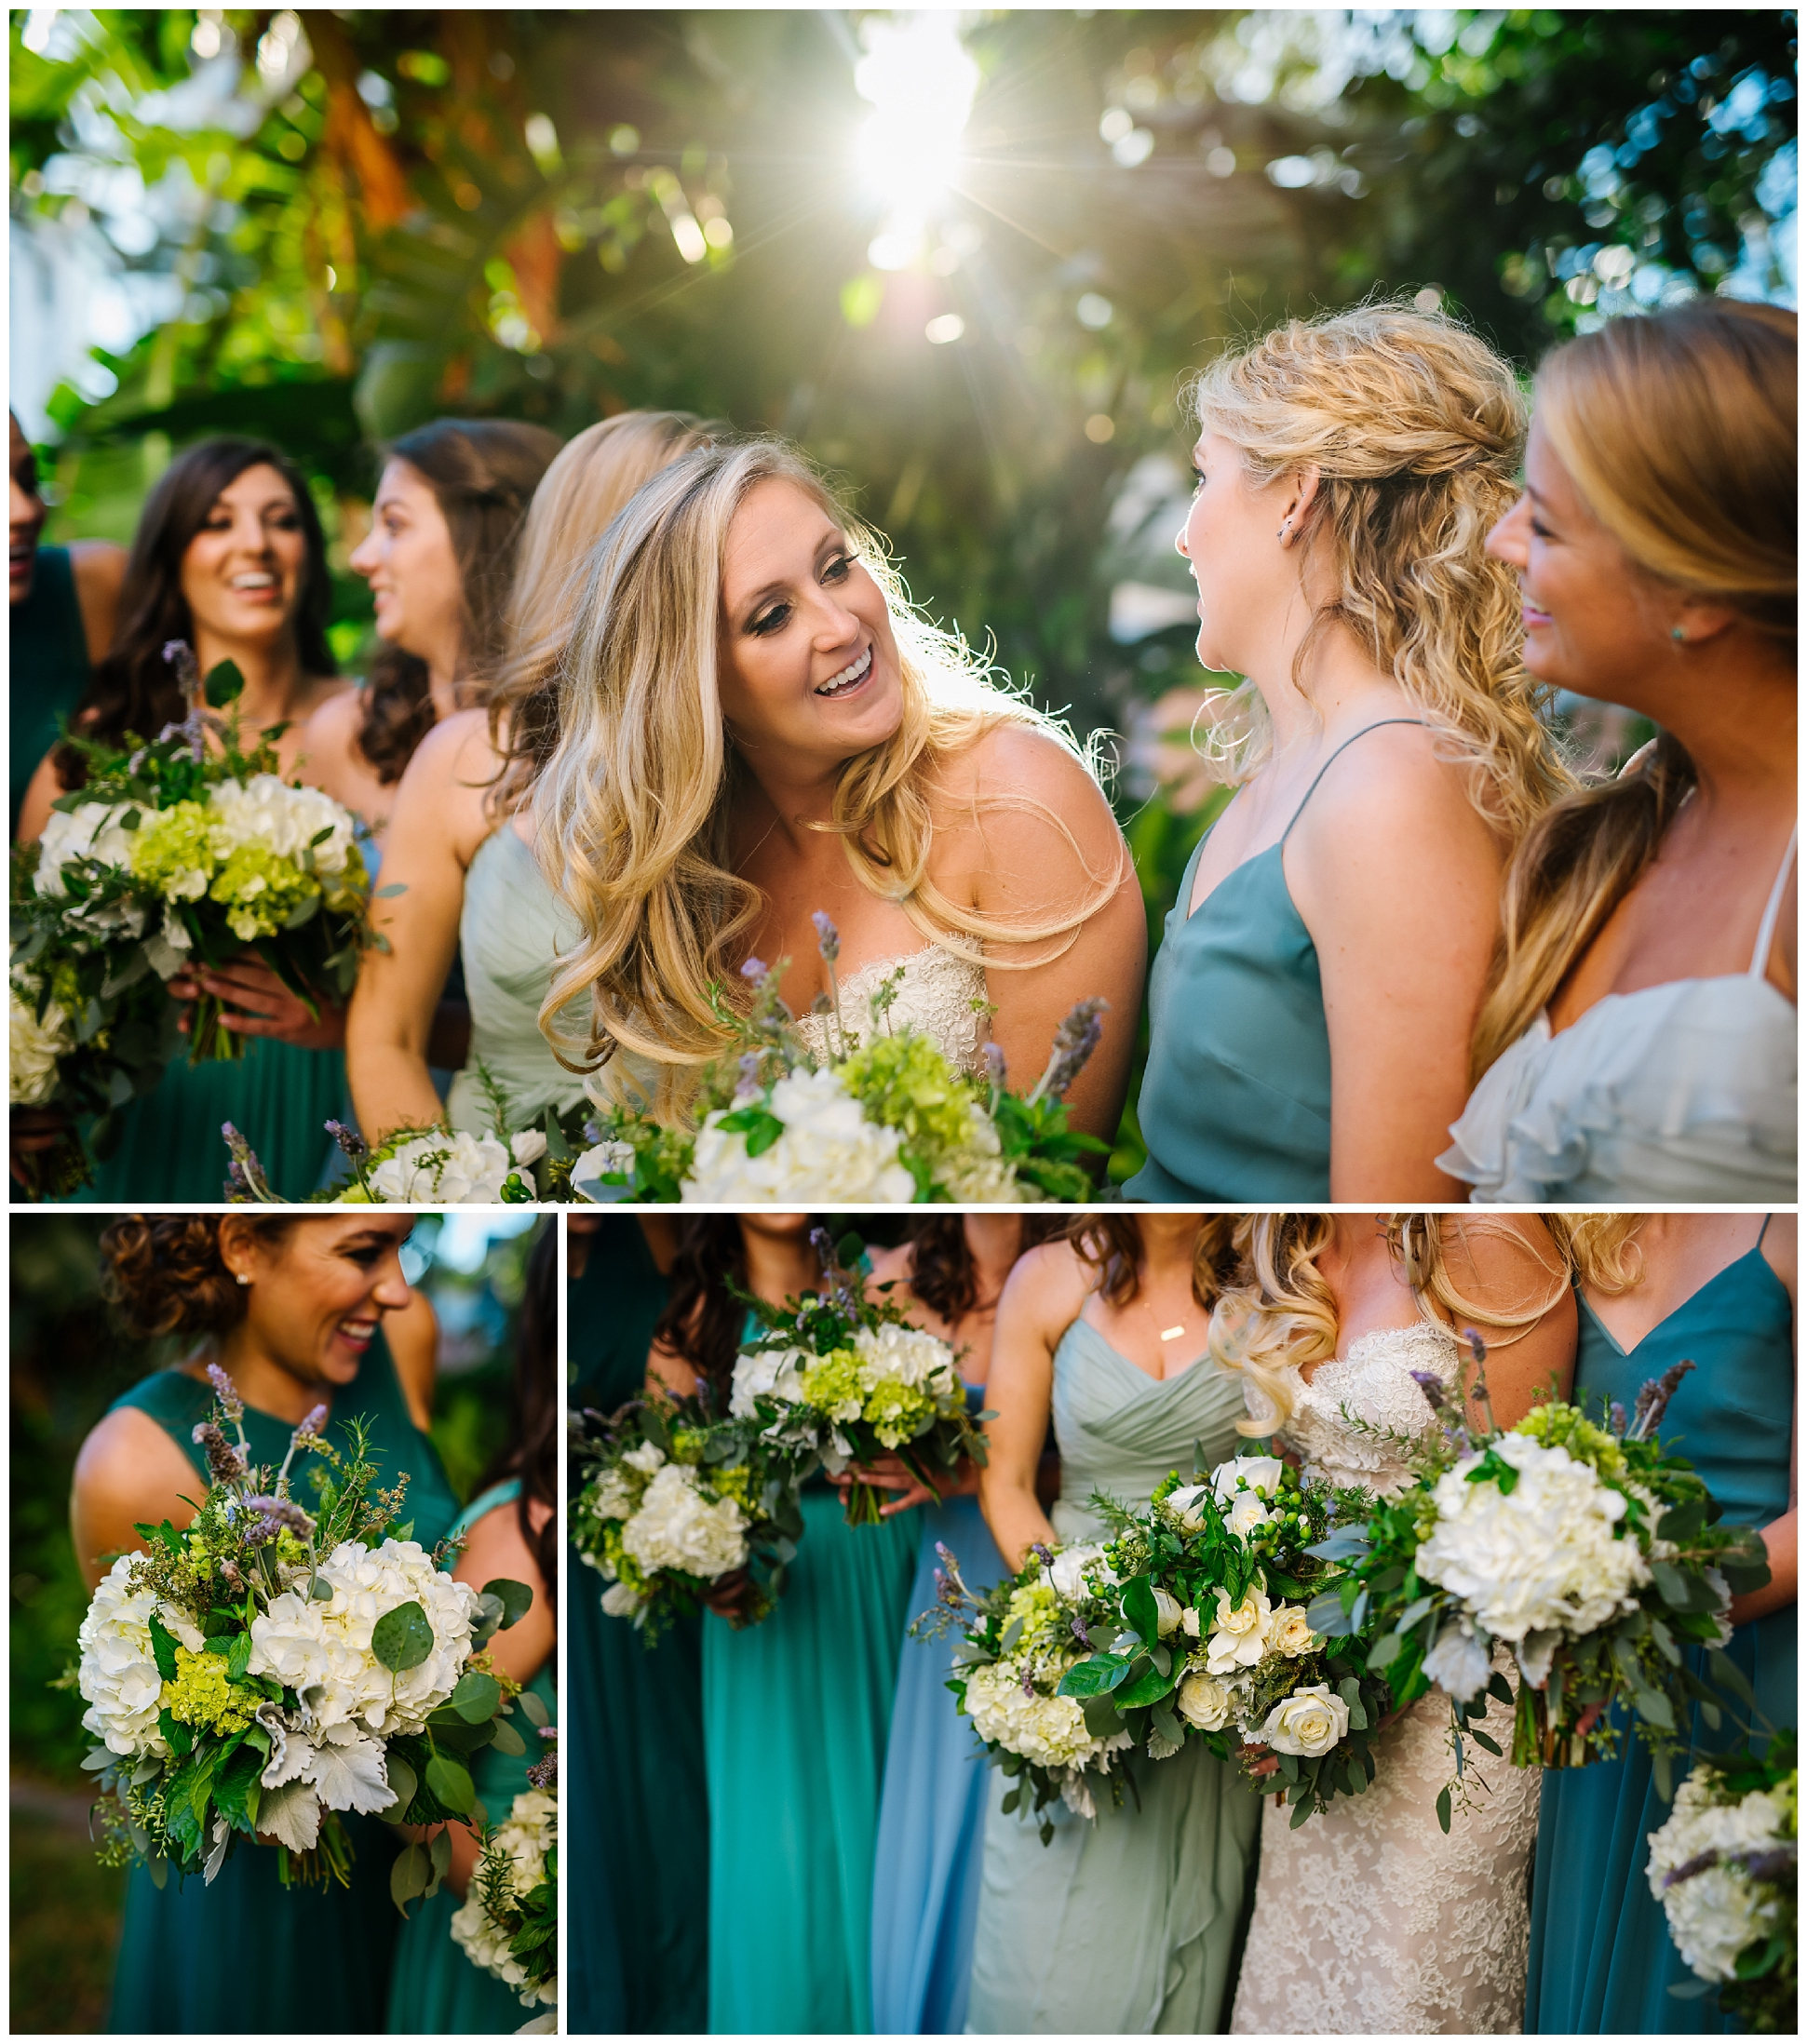 St-pete-wedding-photographer-grand-ballroom-vinoy-tea-garden-greek-luxury_0141.jpg